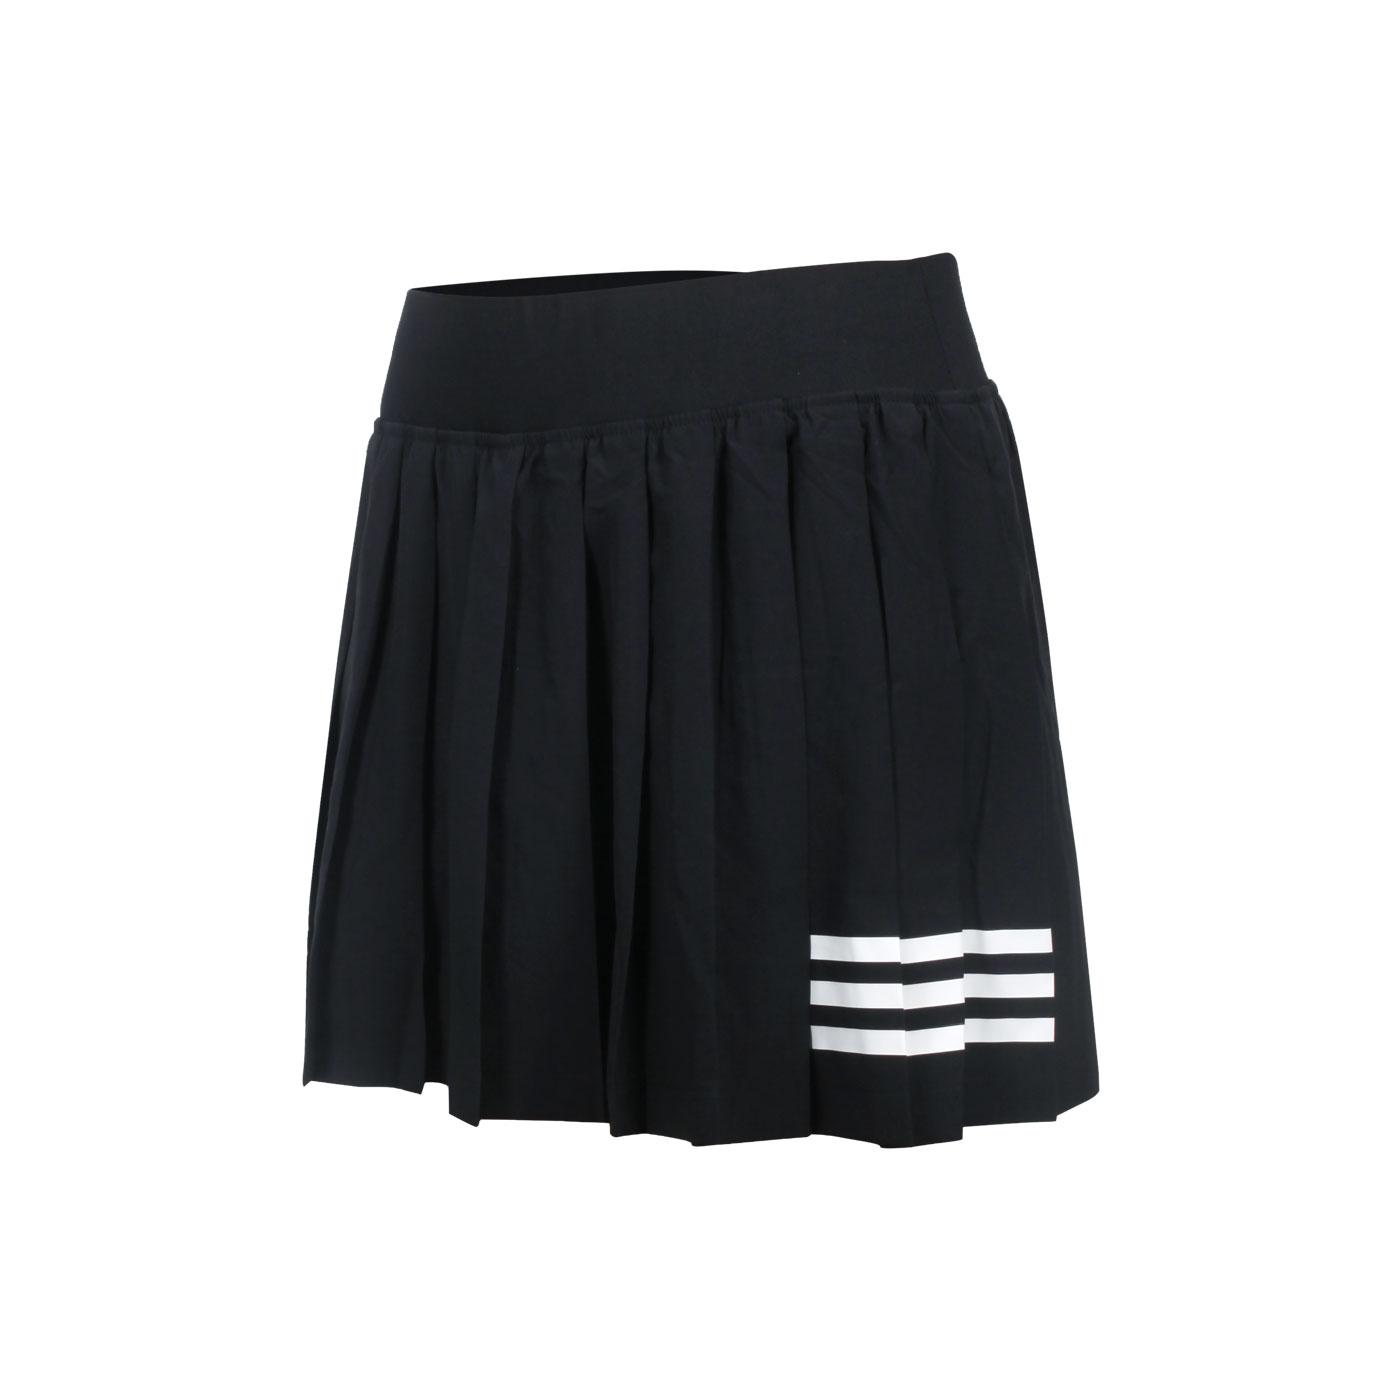 ADIDAS 女款短裙 GL5468 - 黑白